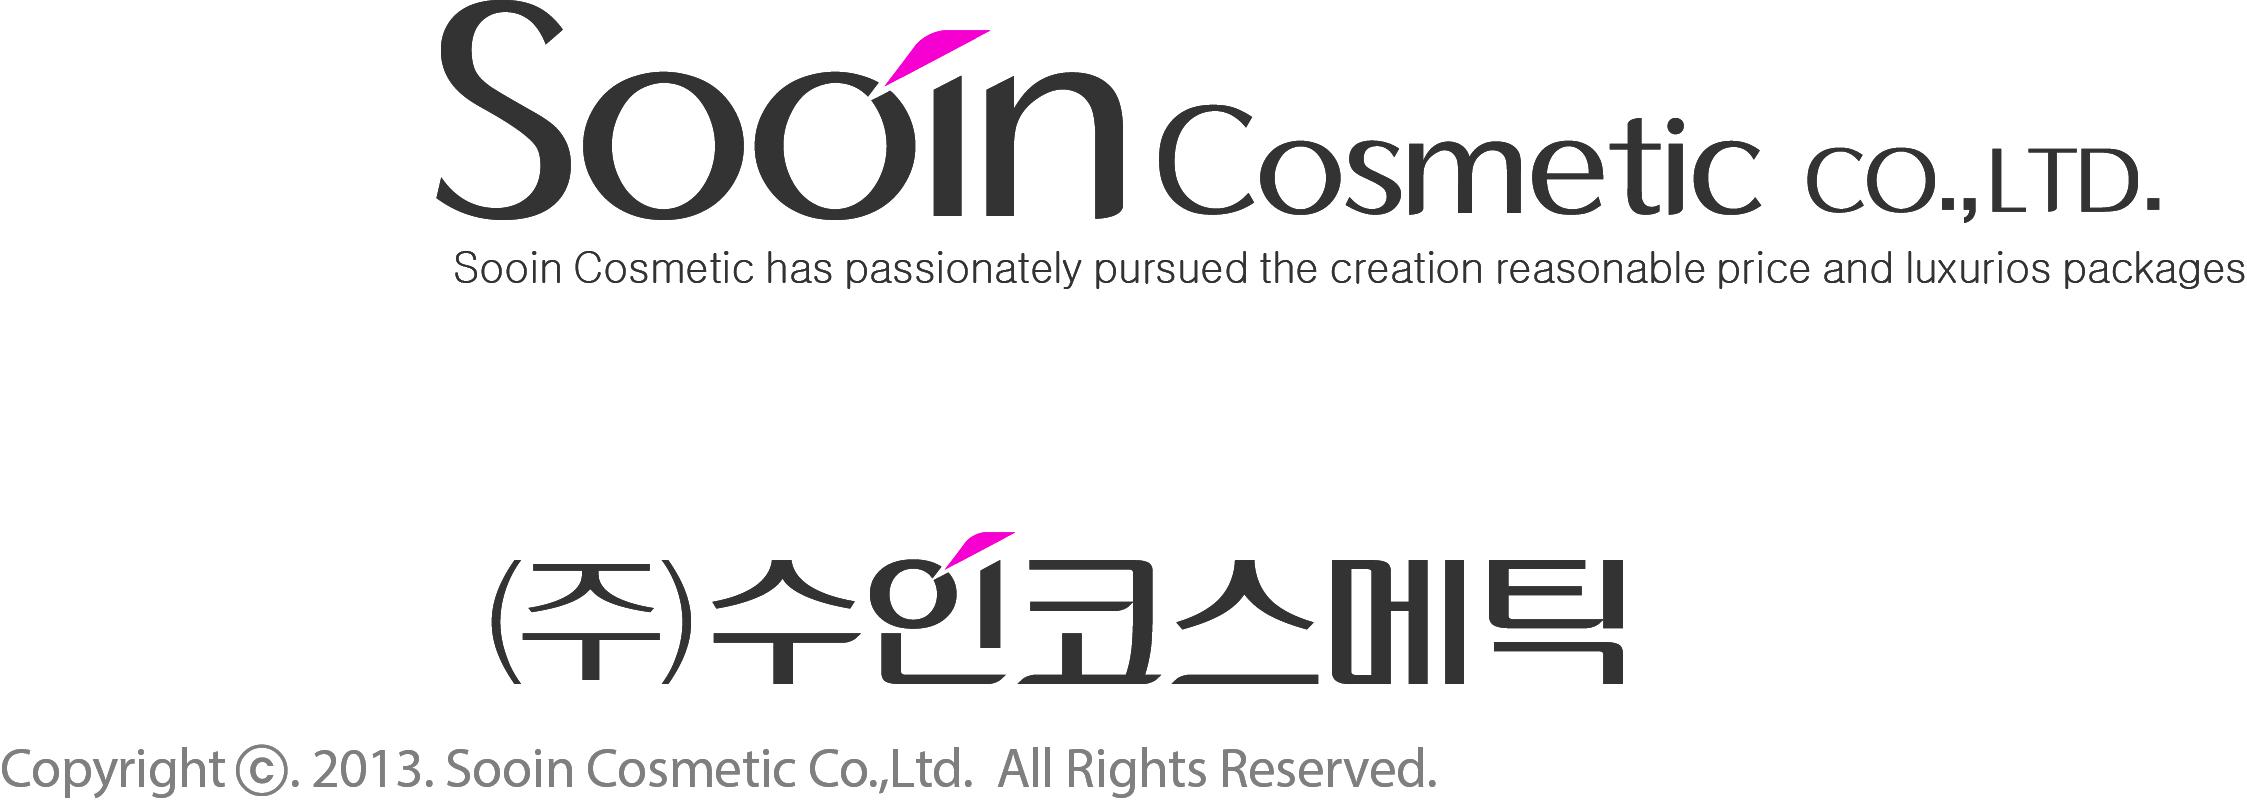 Sooin Cosmetic Co., Ltd.